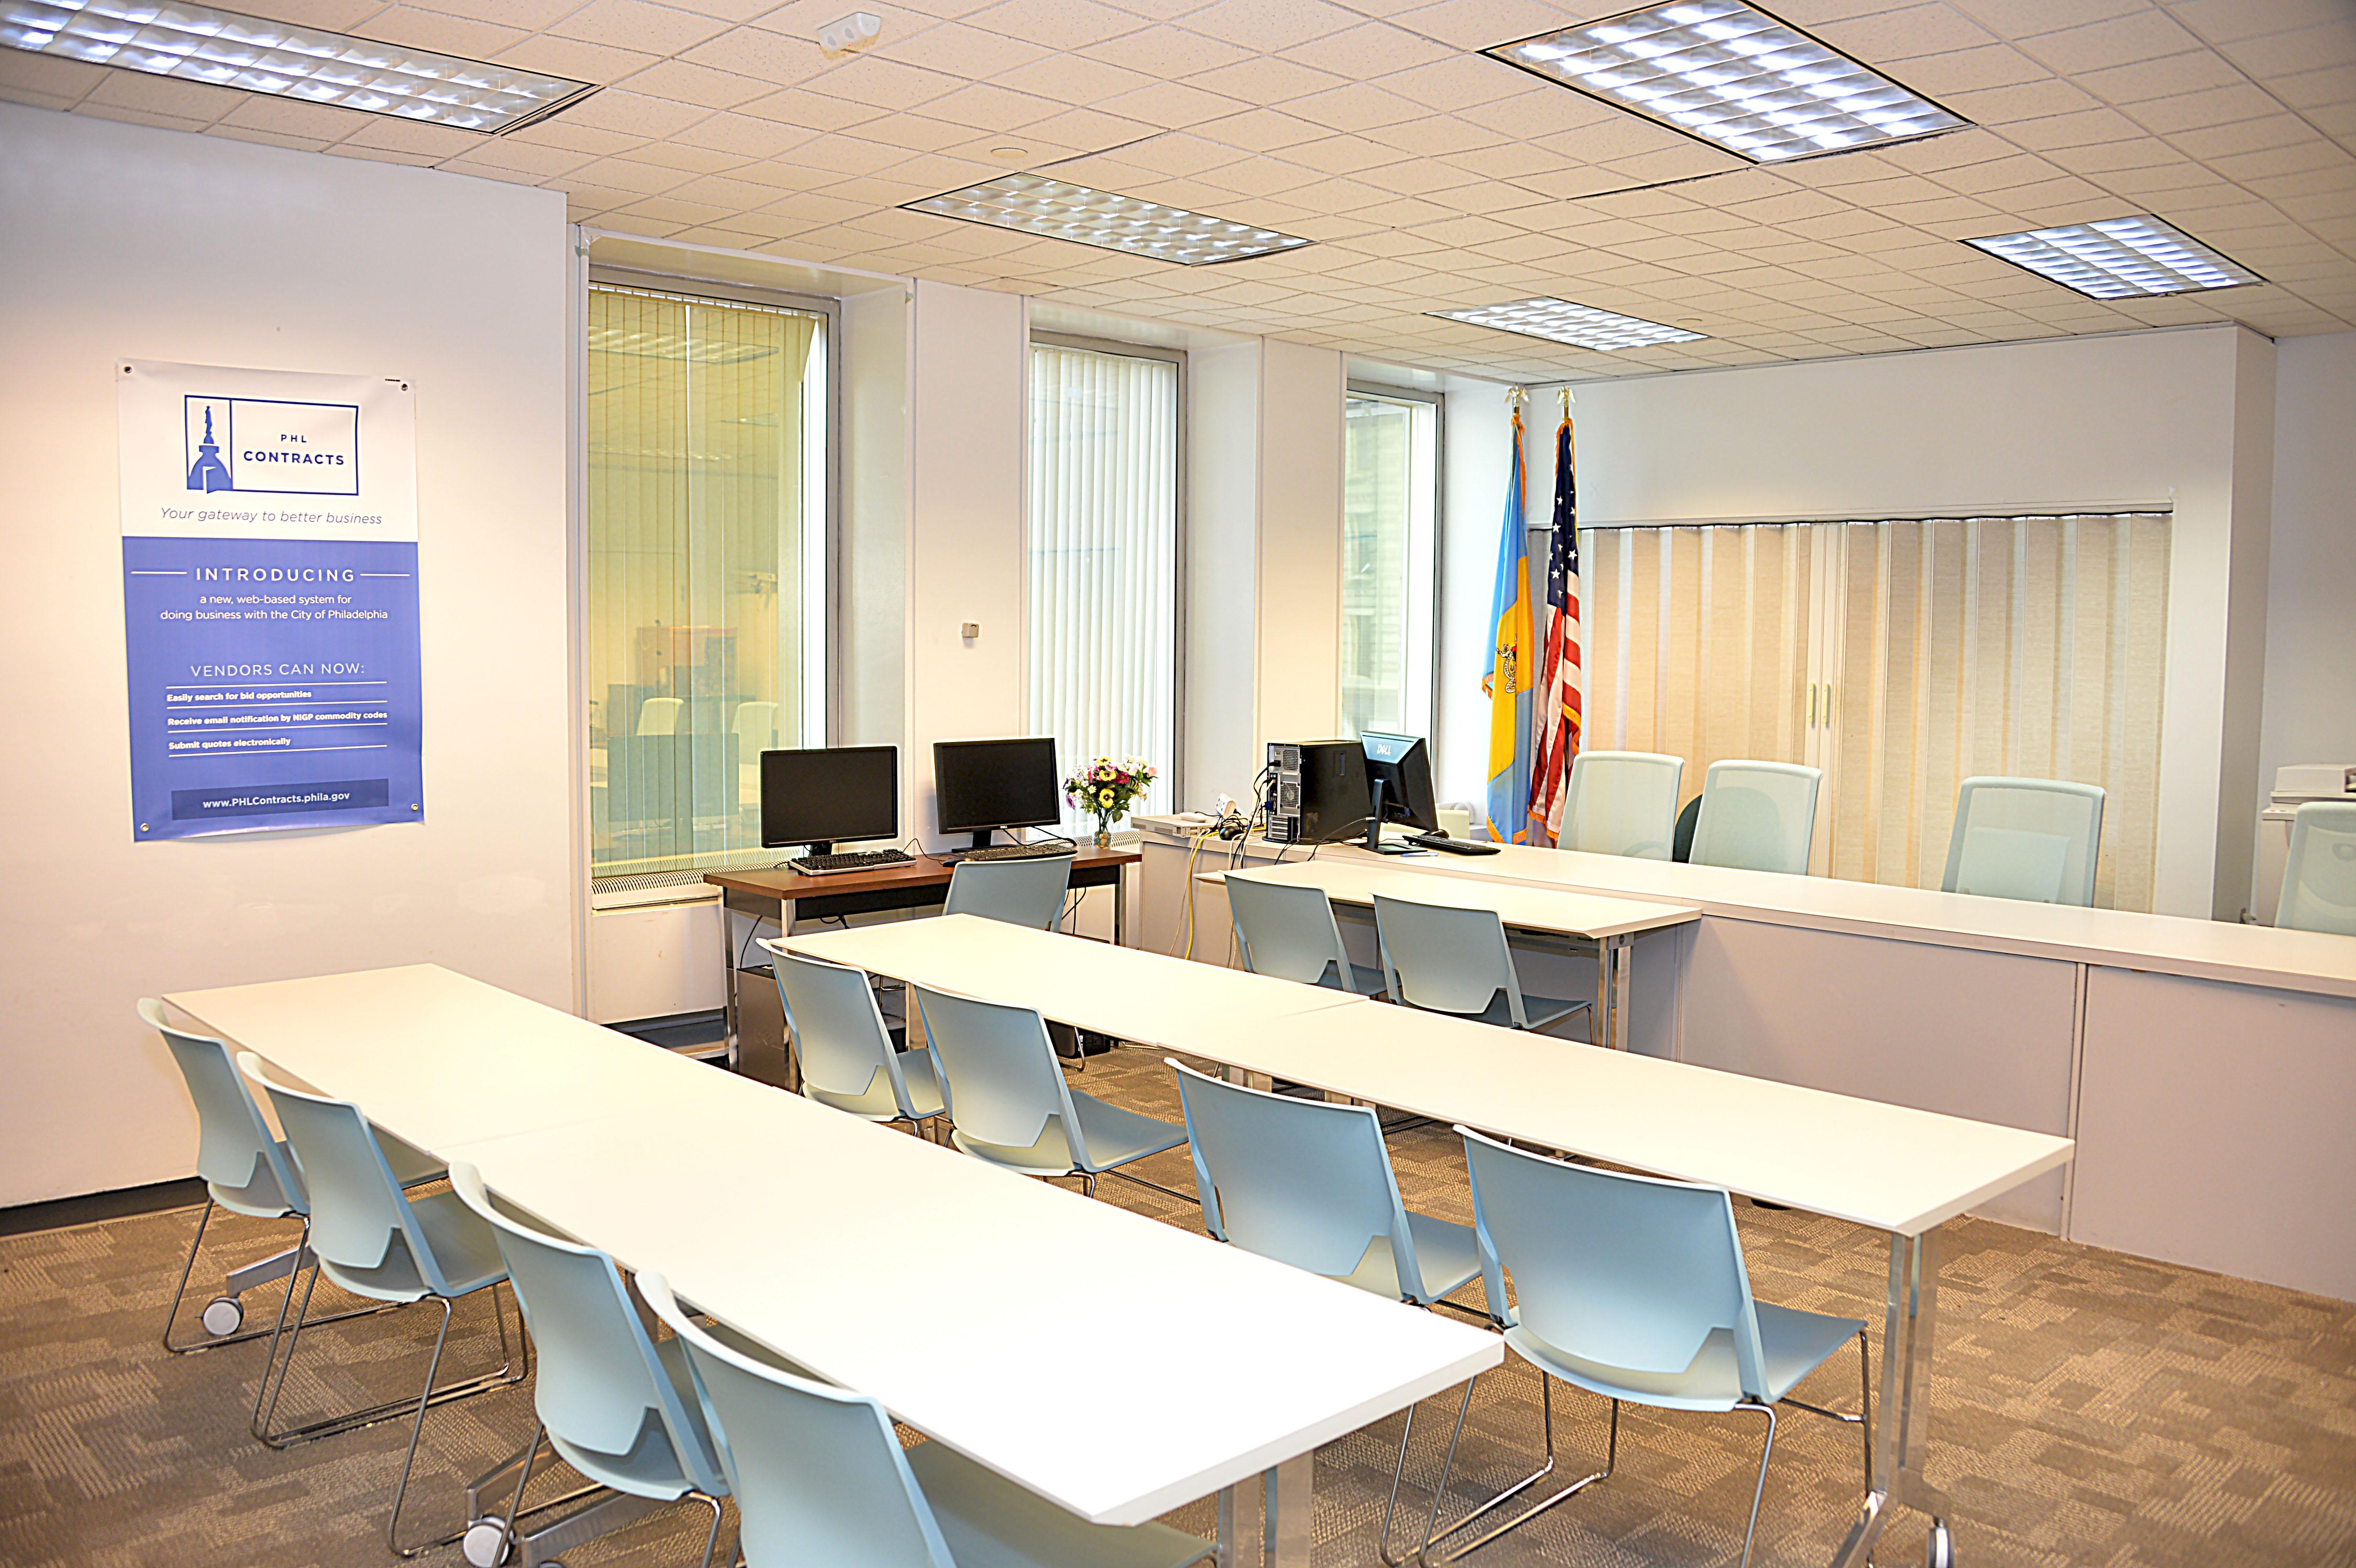 The Bidding room within the City of Philadelphia's Procurement Department. Photo: Peter Fitzpatrick/AL DIA News